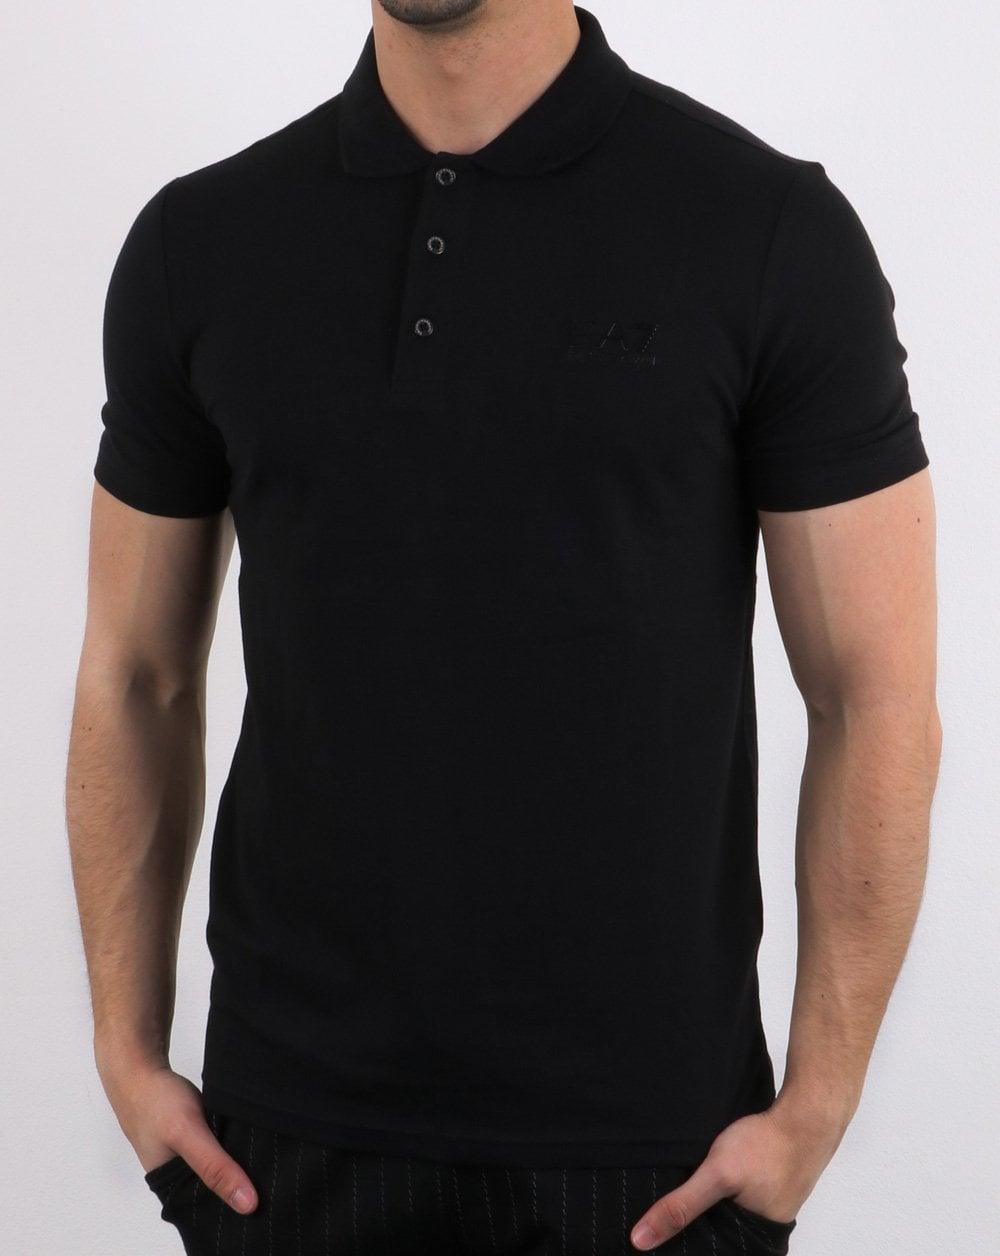 jetzt kaufen preisreduziert verkauft Emporio Armani EA7 Core Logo Pique Polo Shirt Black